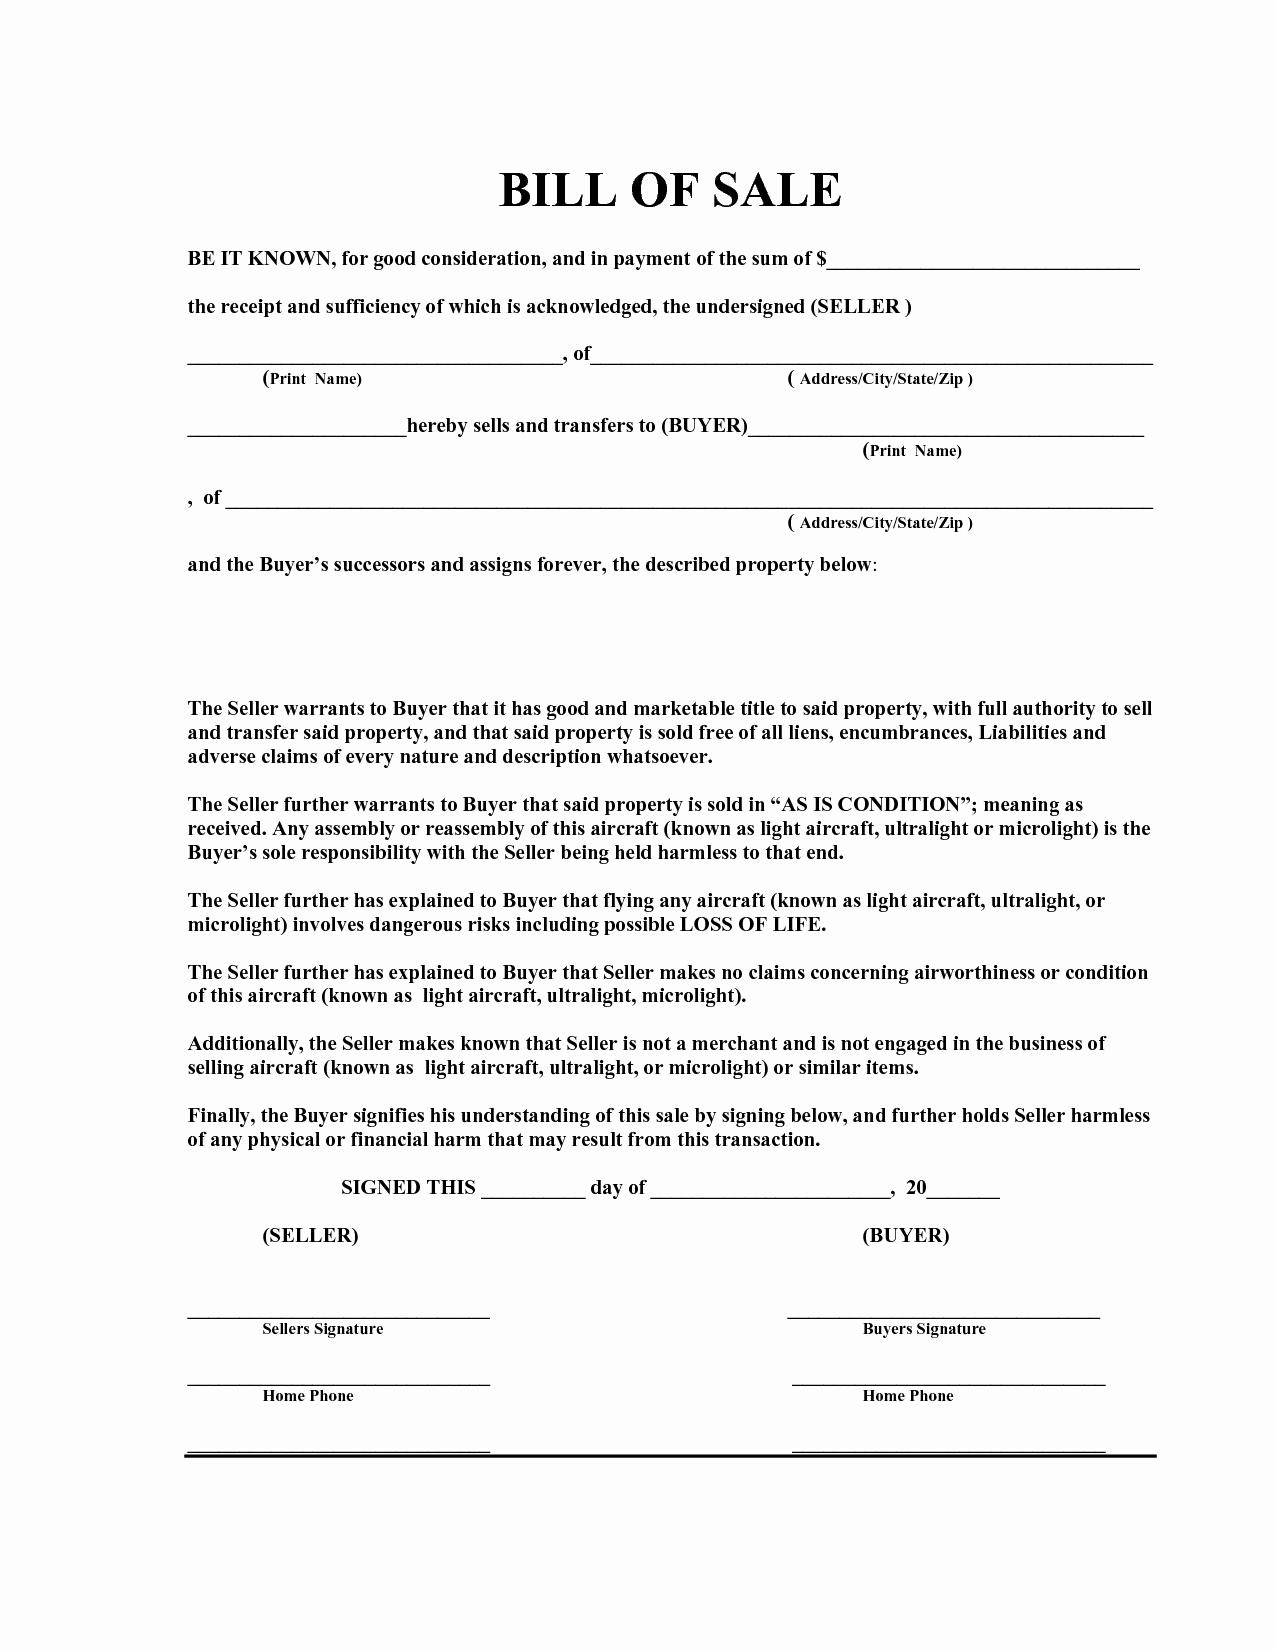 Bill Of Sale Auto Florida Fresh Free Bill Of Sale Template Pdf by Marymenti as is Bill